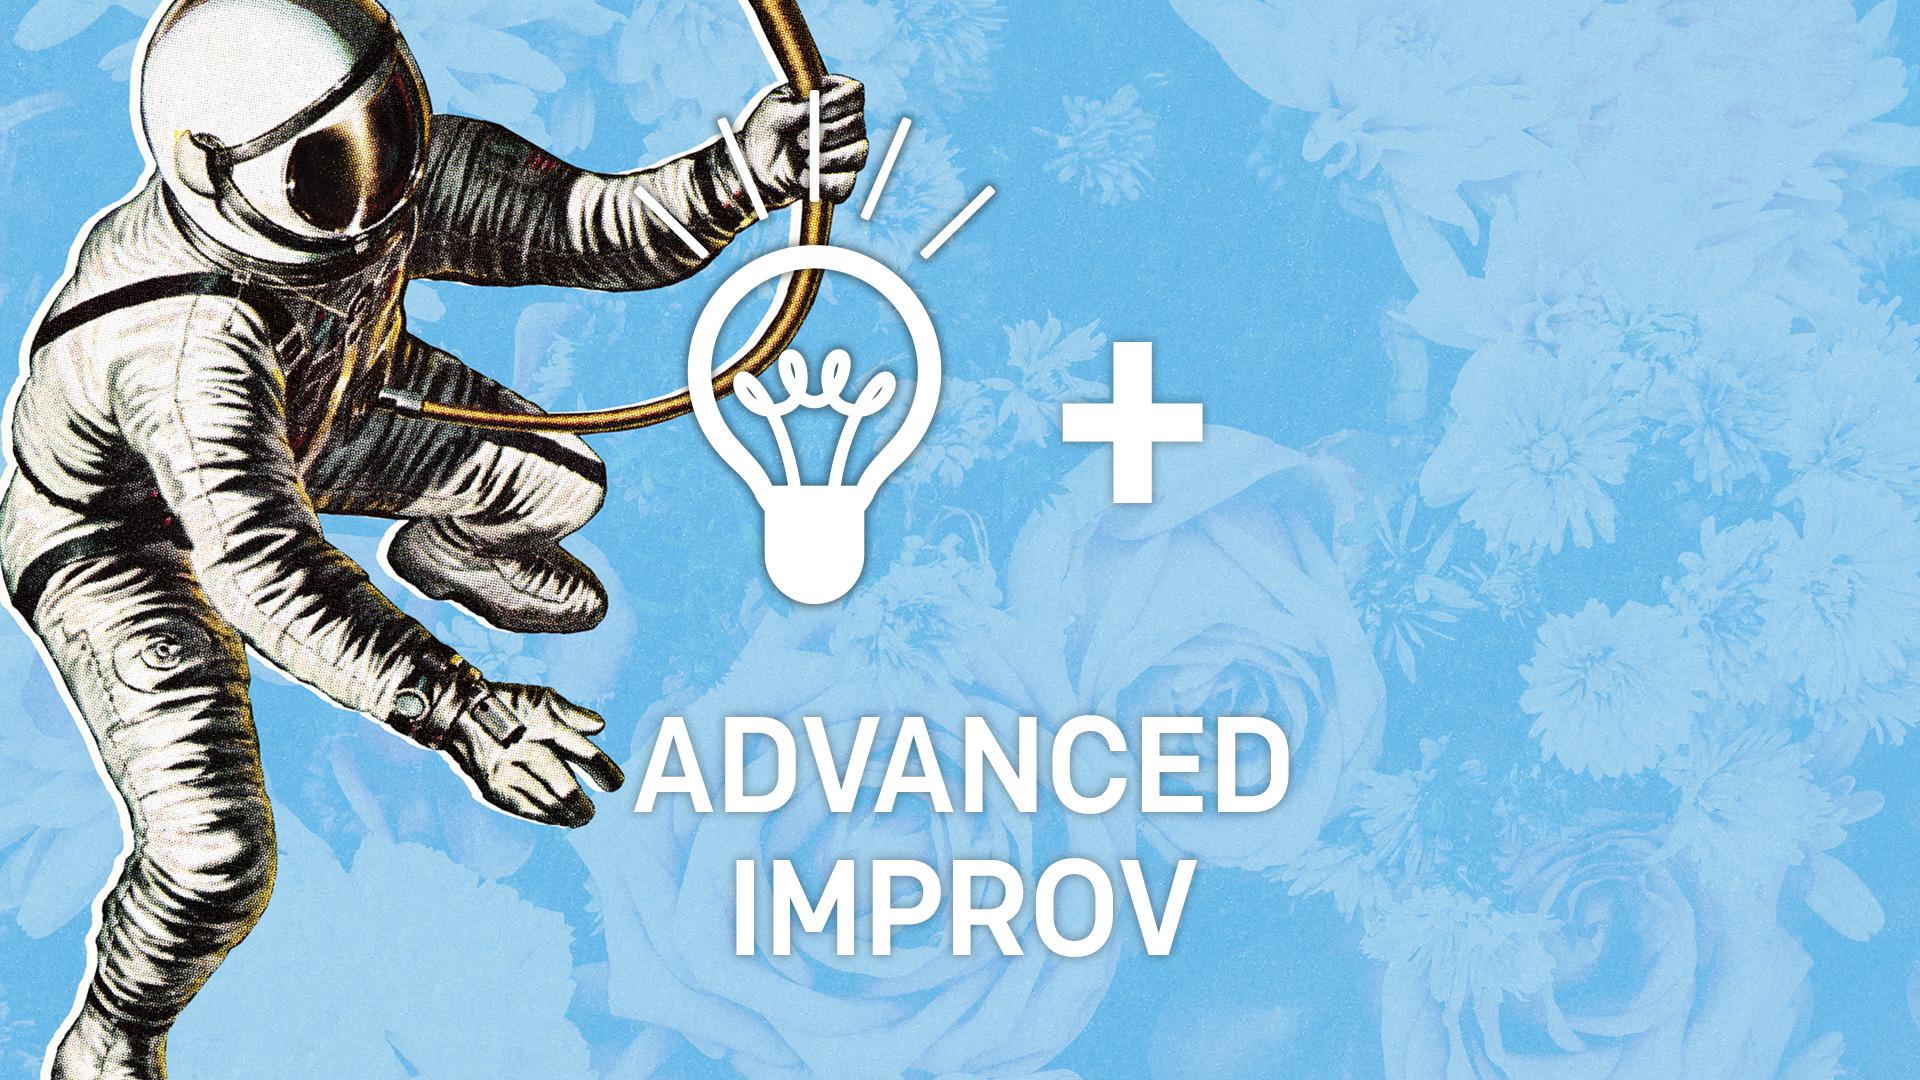 Advanced Improv Program